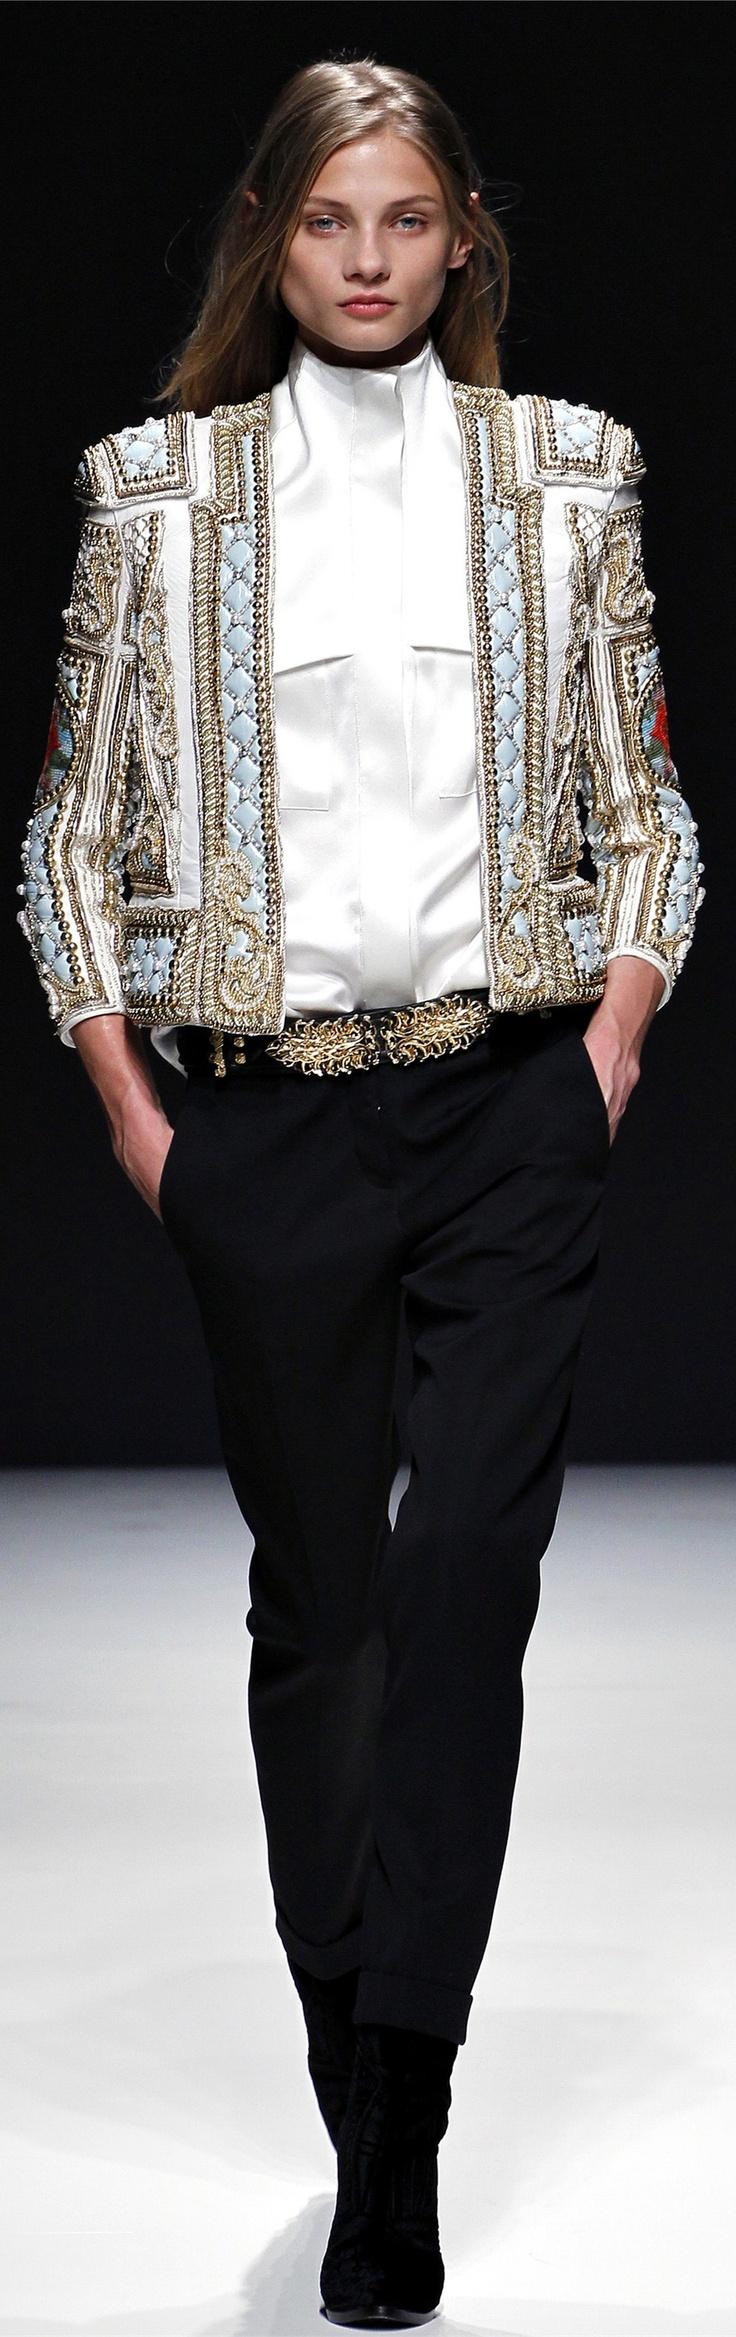 ✪ Balmain Collection Fall Winter 2012-2013 ✪ http://www.vogue.co.uk/fashion/autumn-winter-2012/ready-to-wear/balmain#